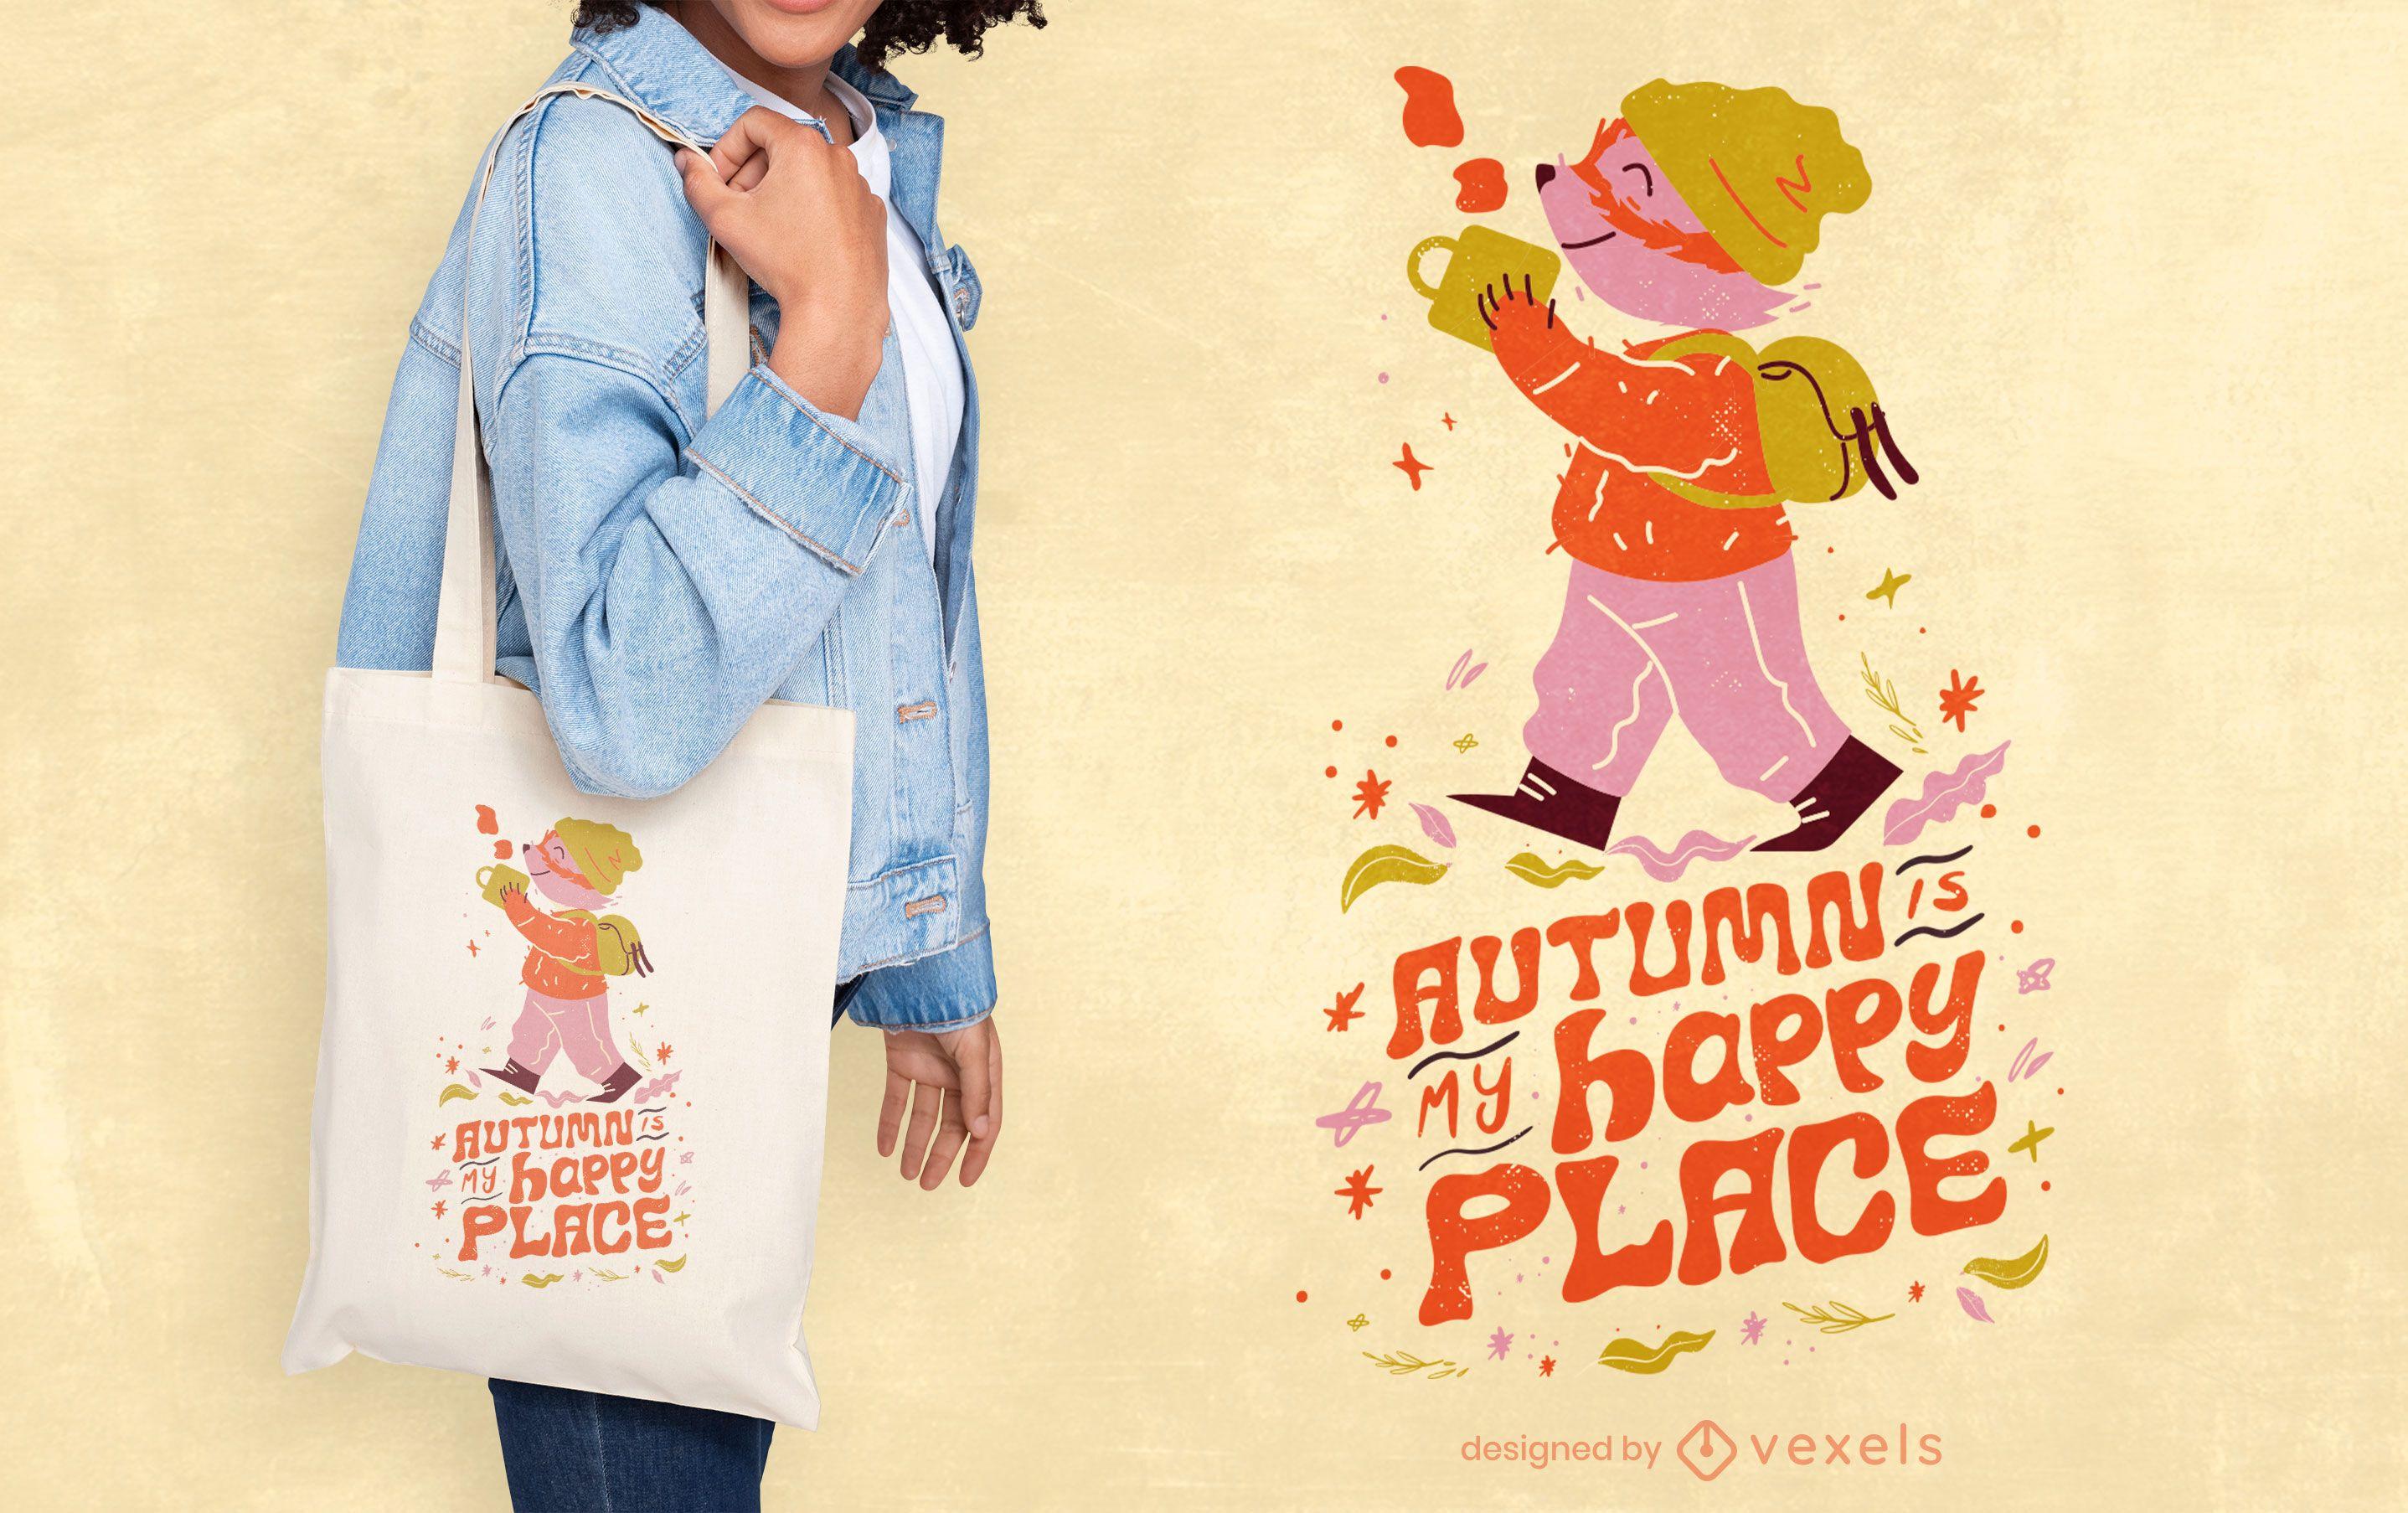 Autumn season happy place quote tote bag